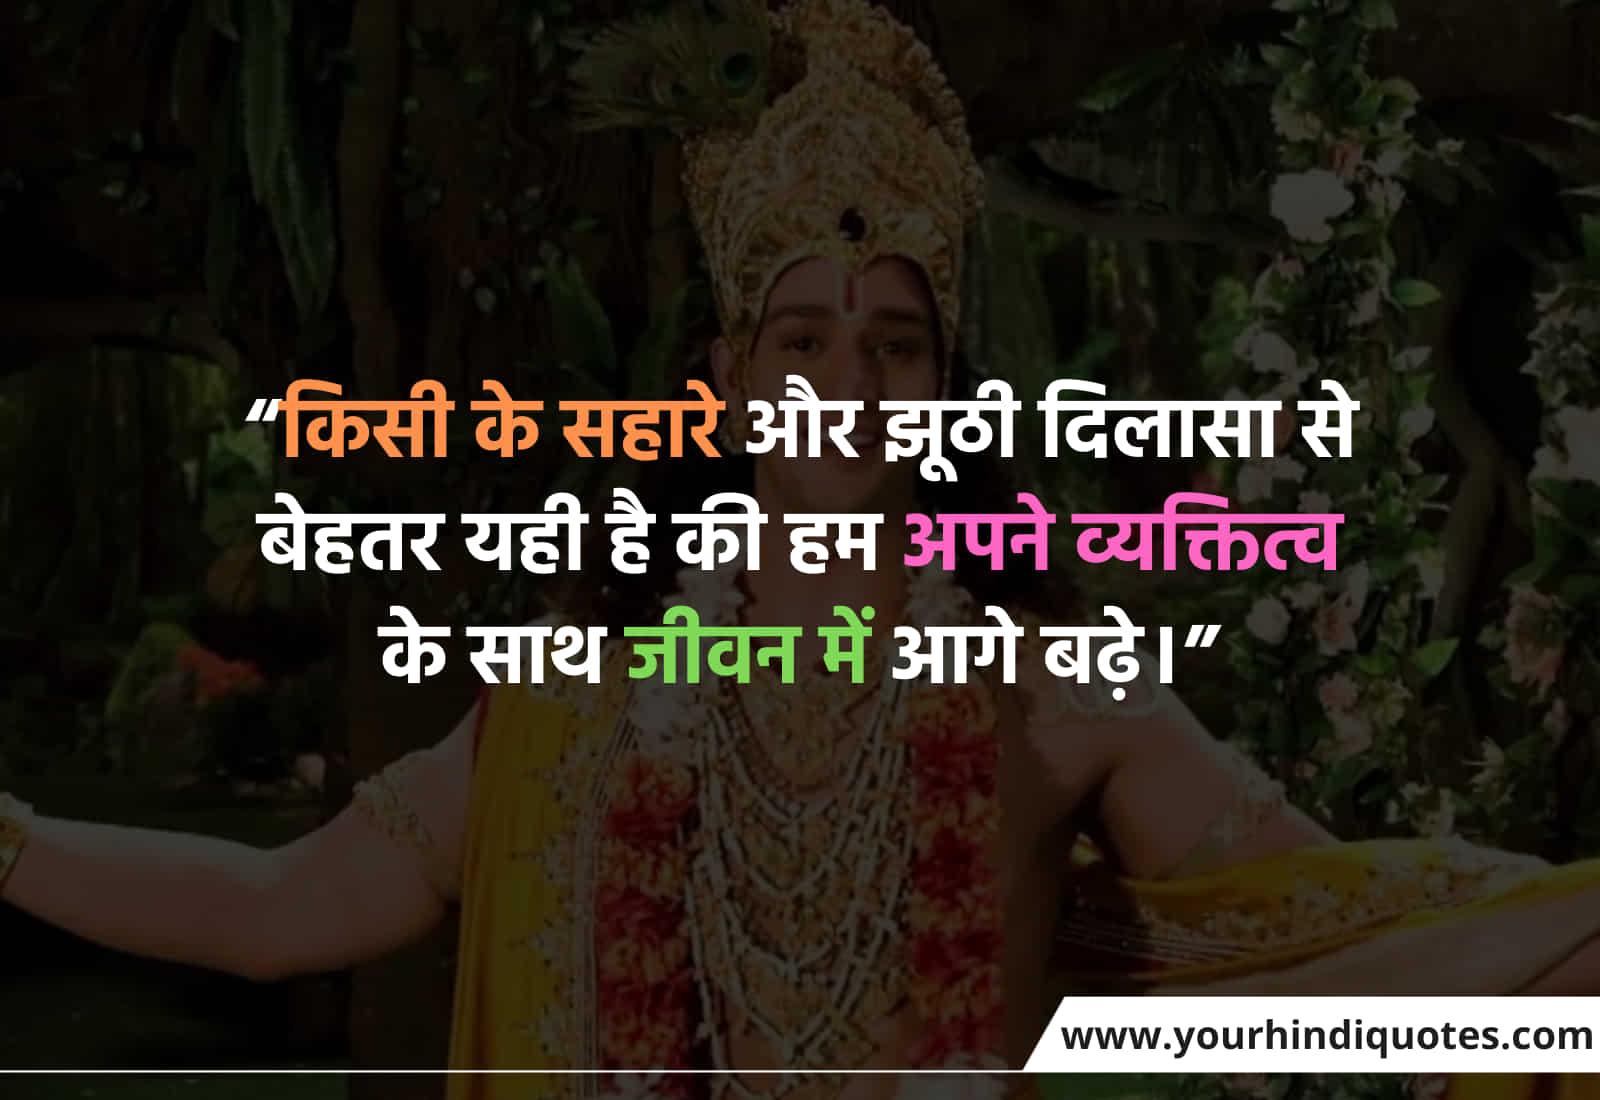 Shrimad Bhagwat Gita Goal Quotes In Hindi